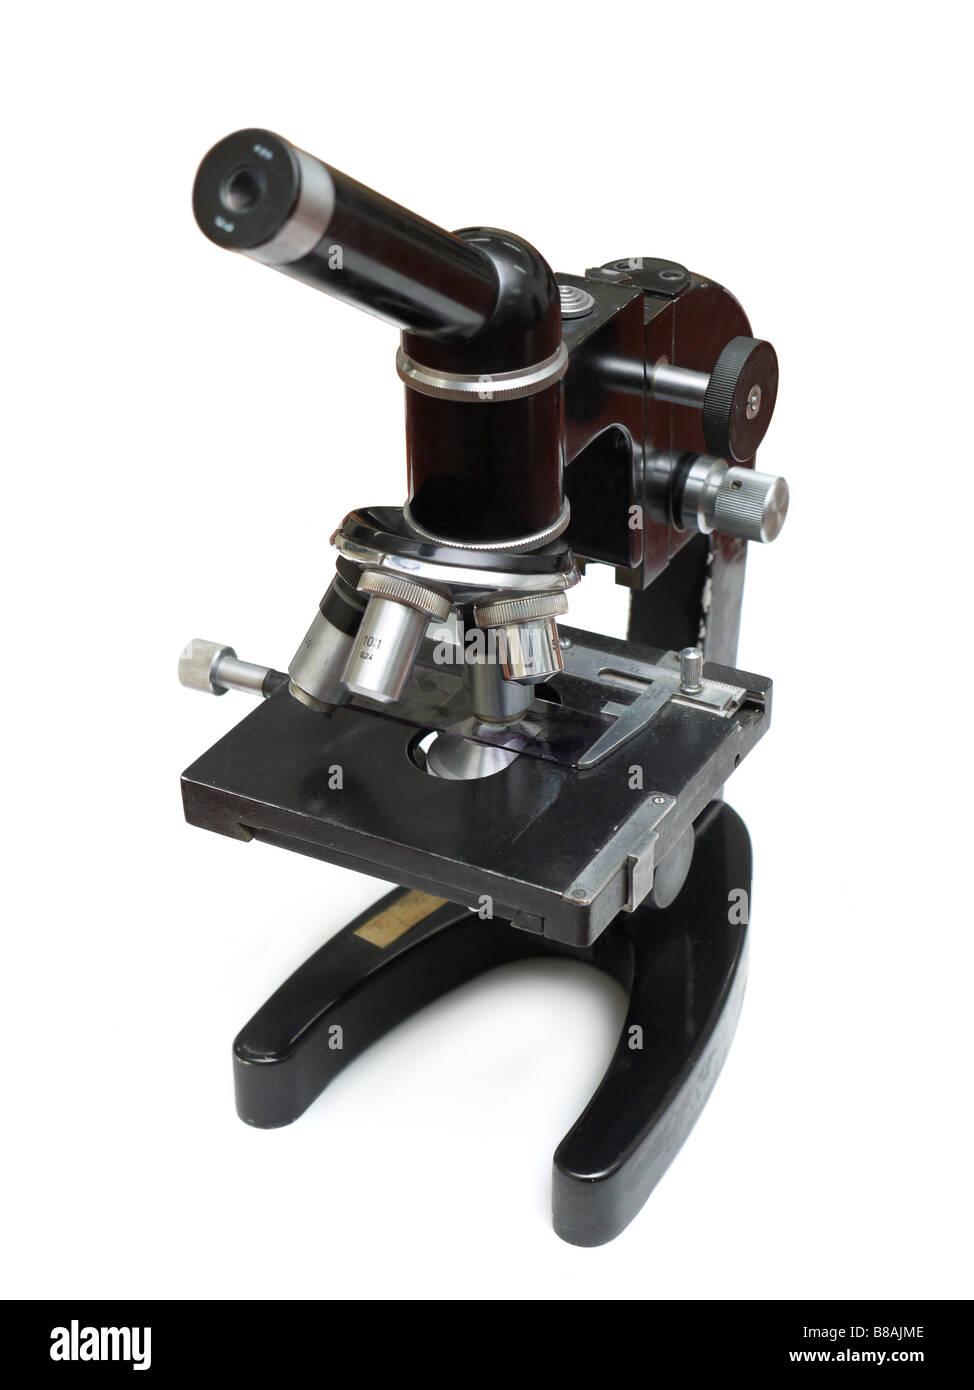 Old monocular microscope shot over white background - Stock Image